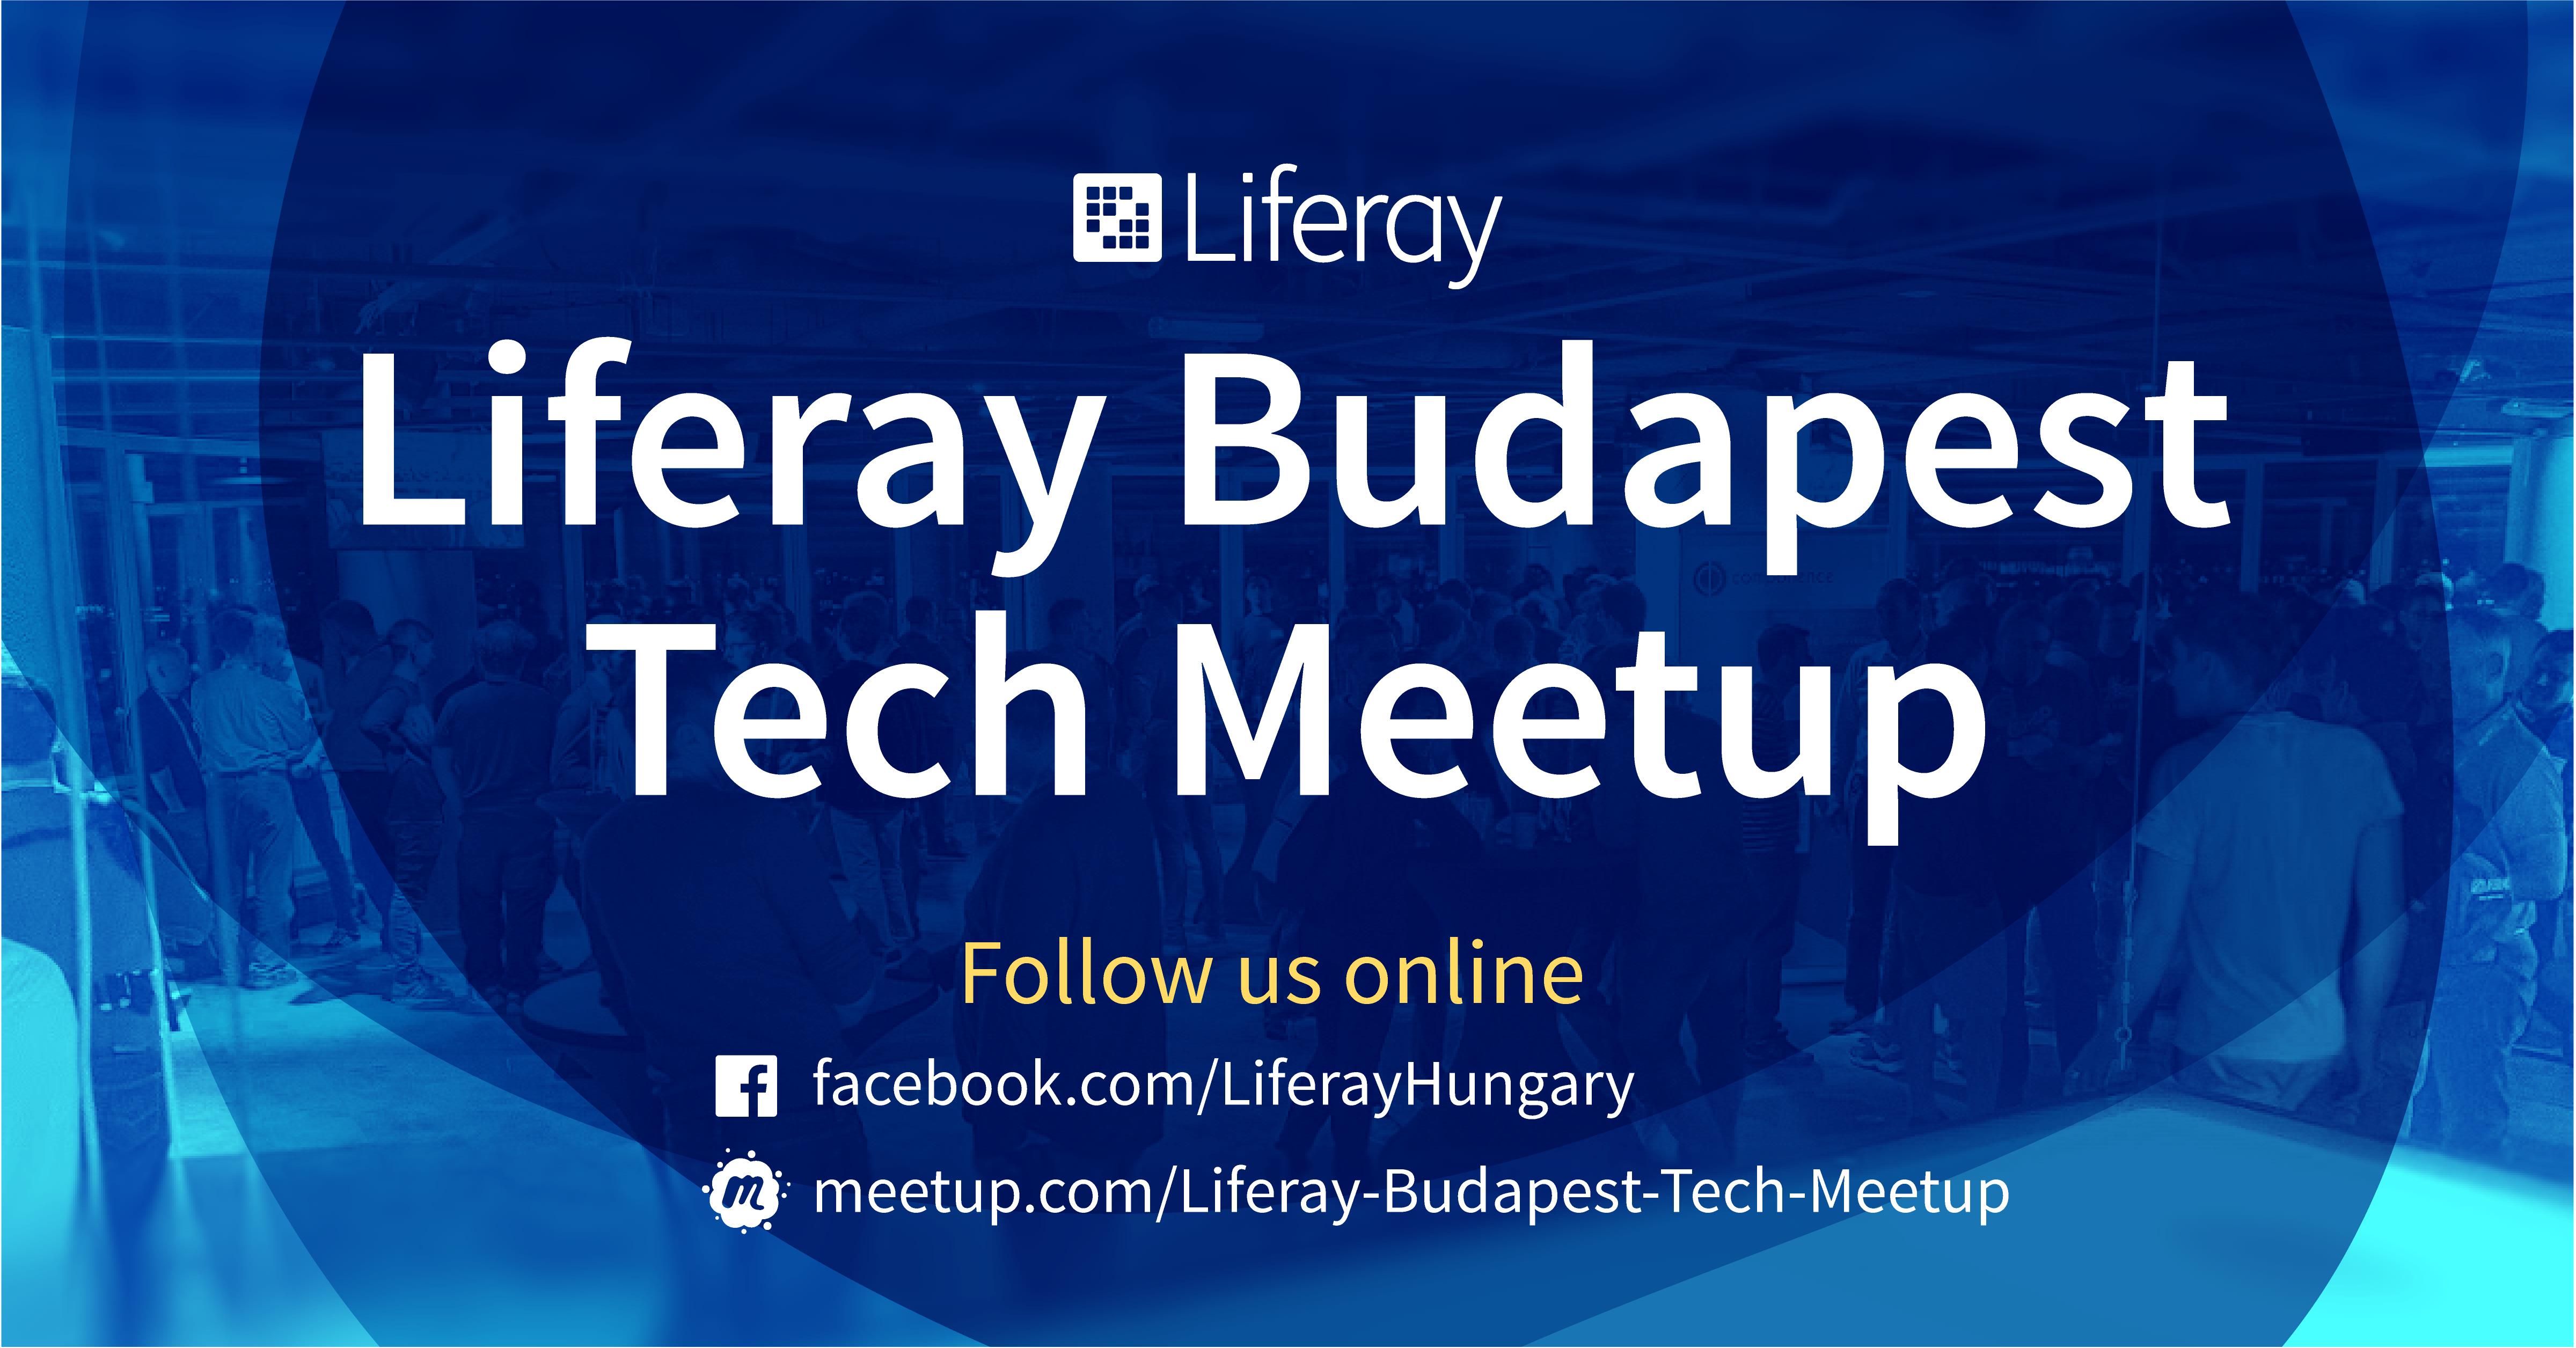 Liferay Budapest Tech Meetup